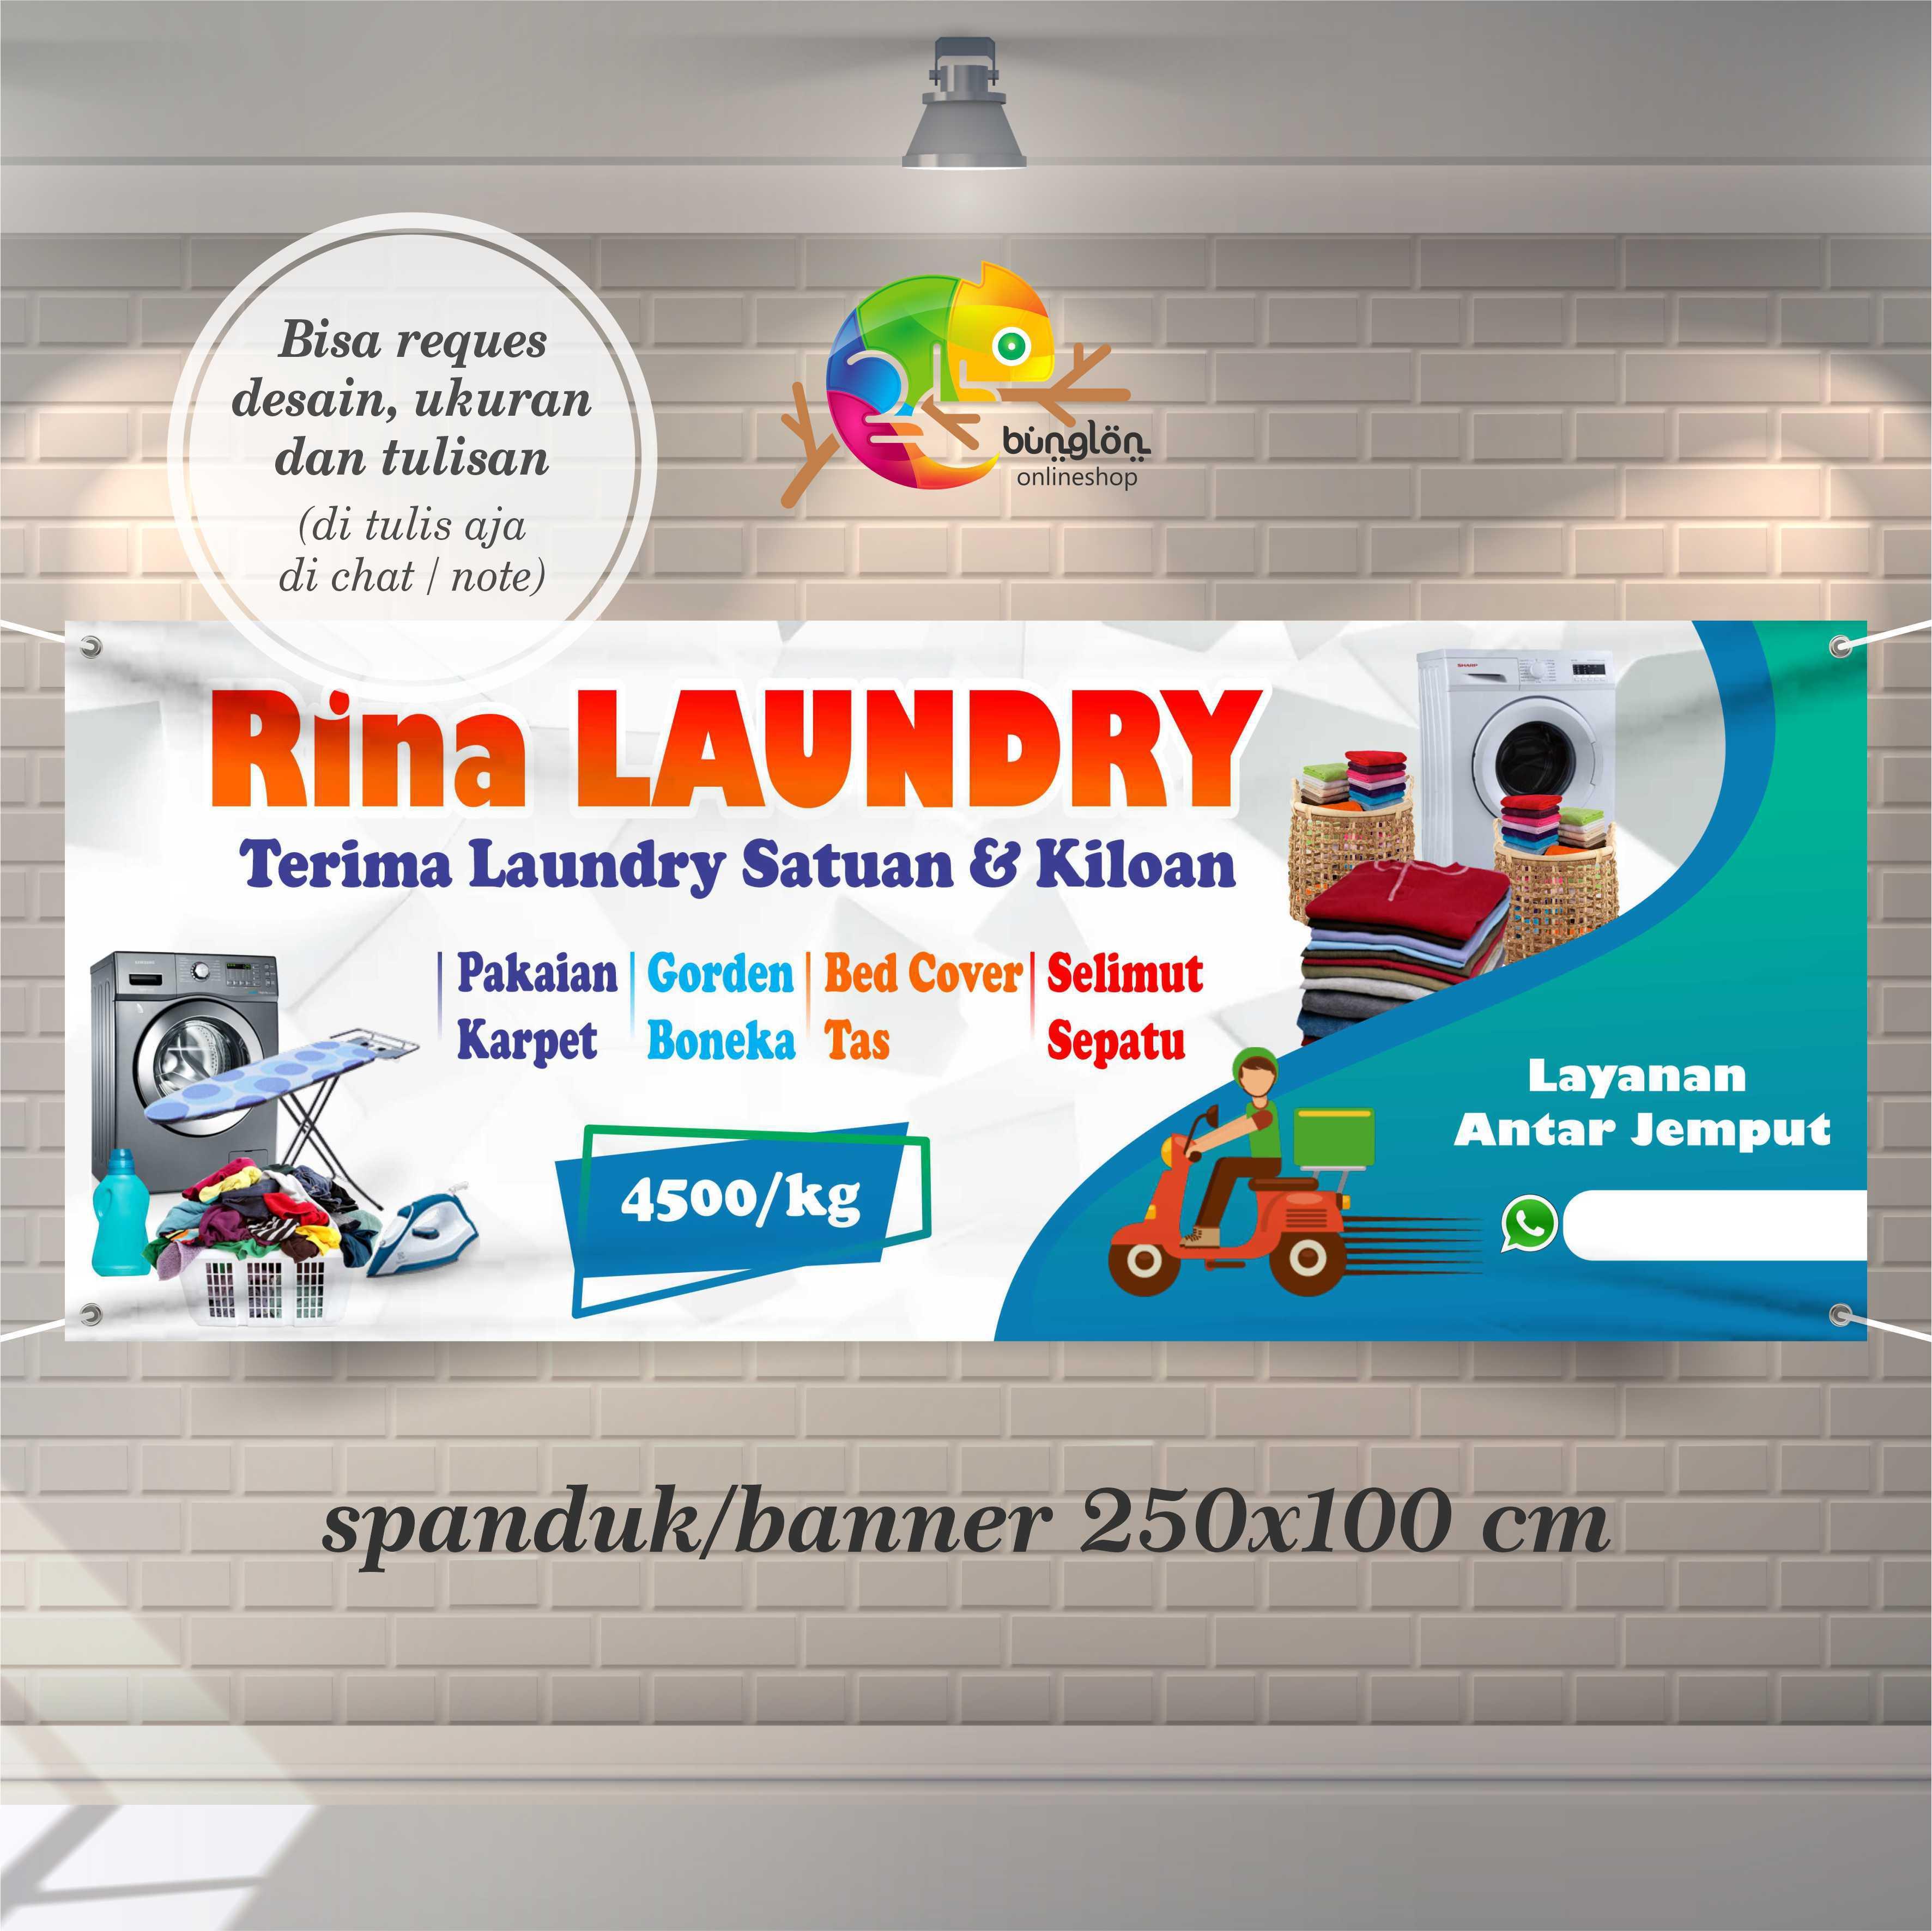 Jual Banner Spanduk Laundry Terbaru Lazada Co Id